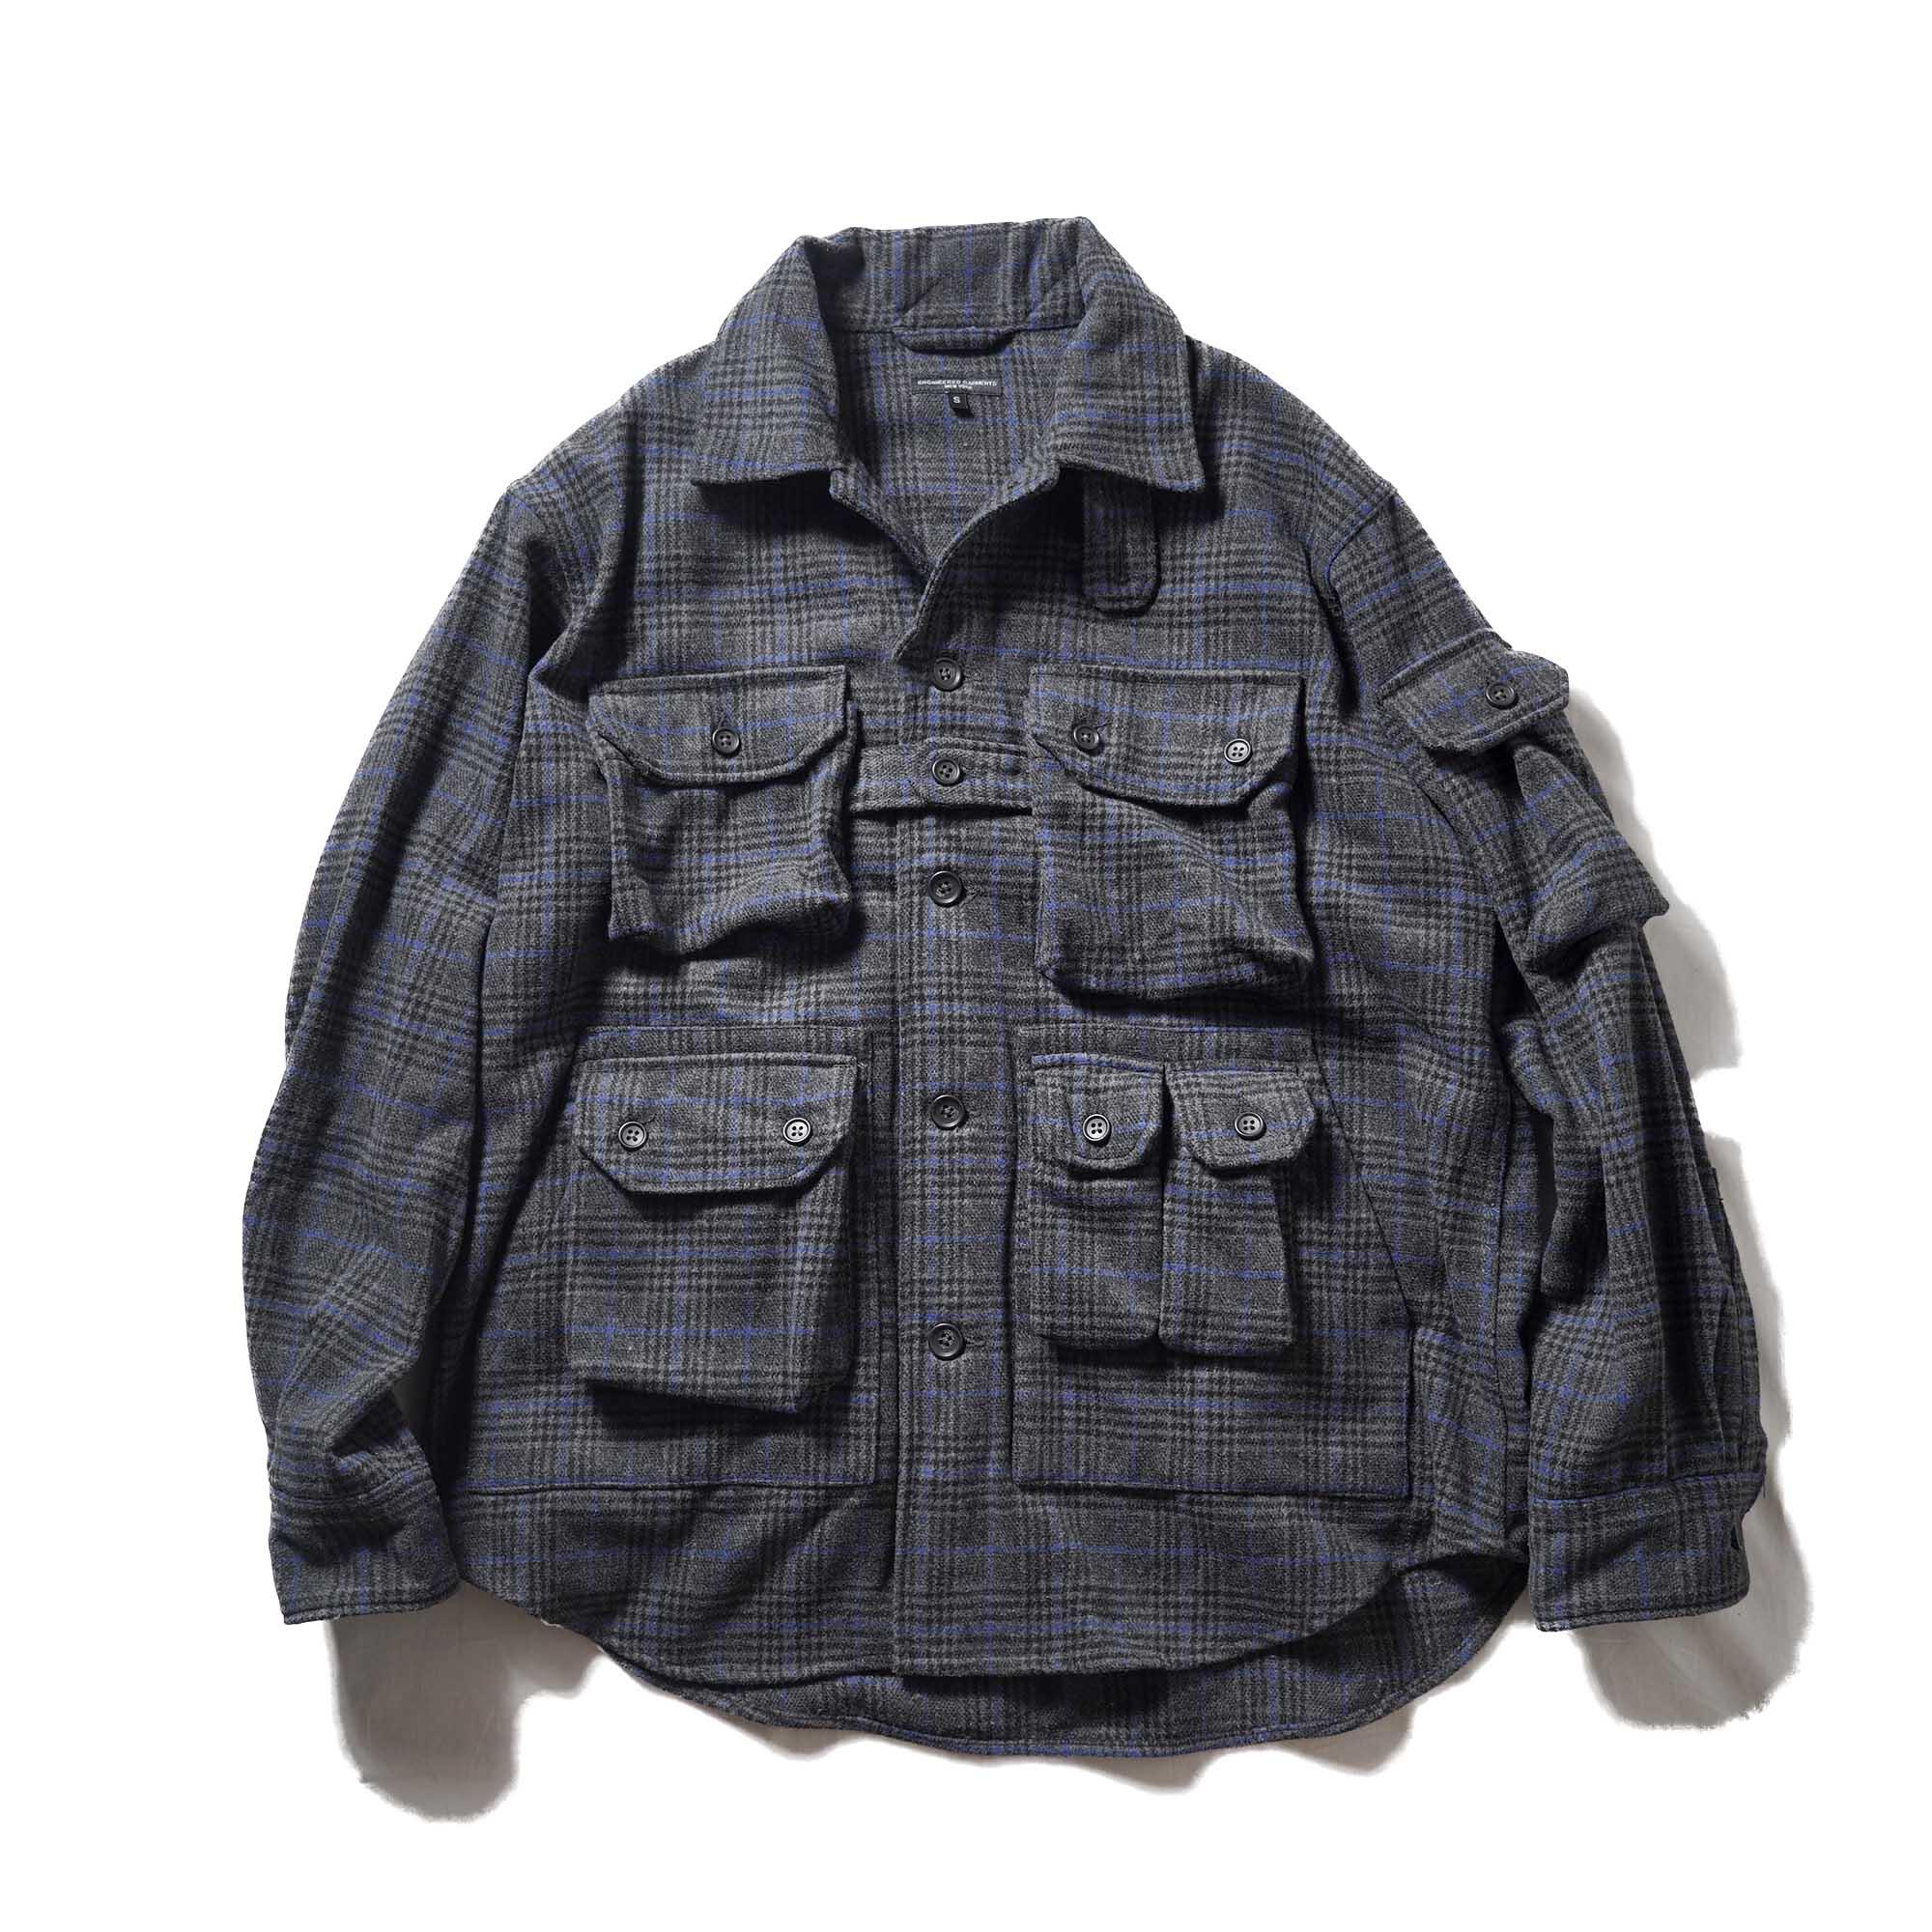 Engineered Garments / EXPLORER SHIRT JACKET - POLY WOOL GLEN PLAID (Dk.Gray / Blue)